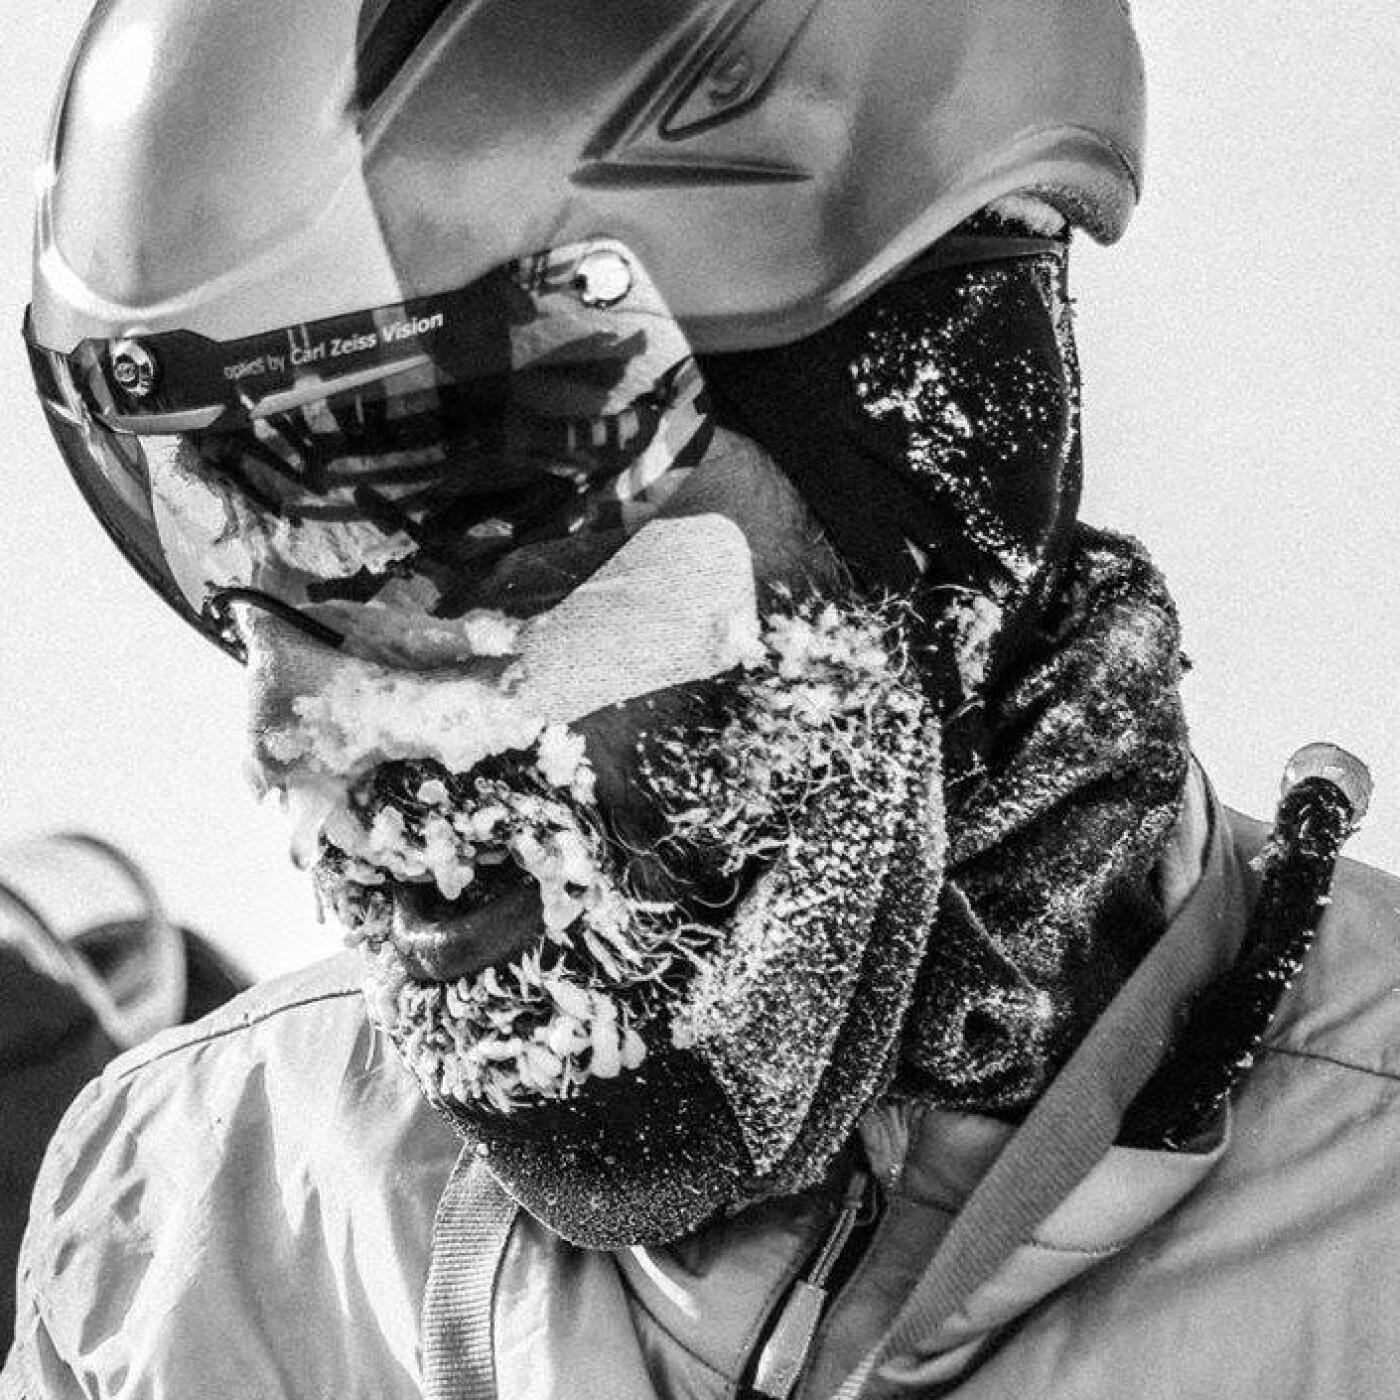 Patrick Lamarre parle de sa rencontre avec l'aventure - Globe Trotter 10 01 - Janv 2021 - StereoChic Radio